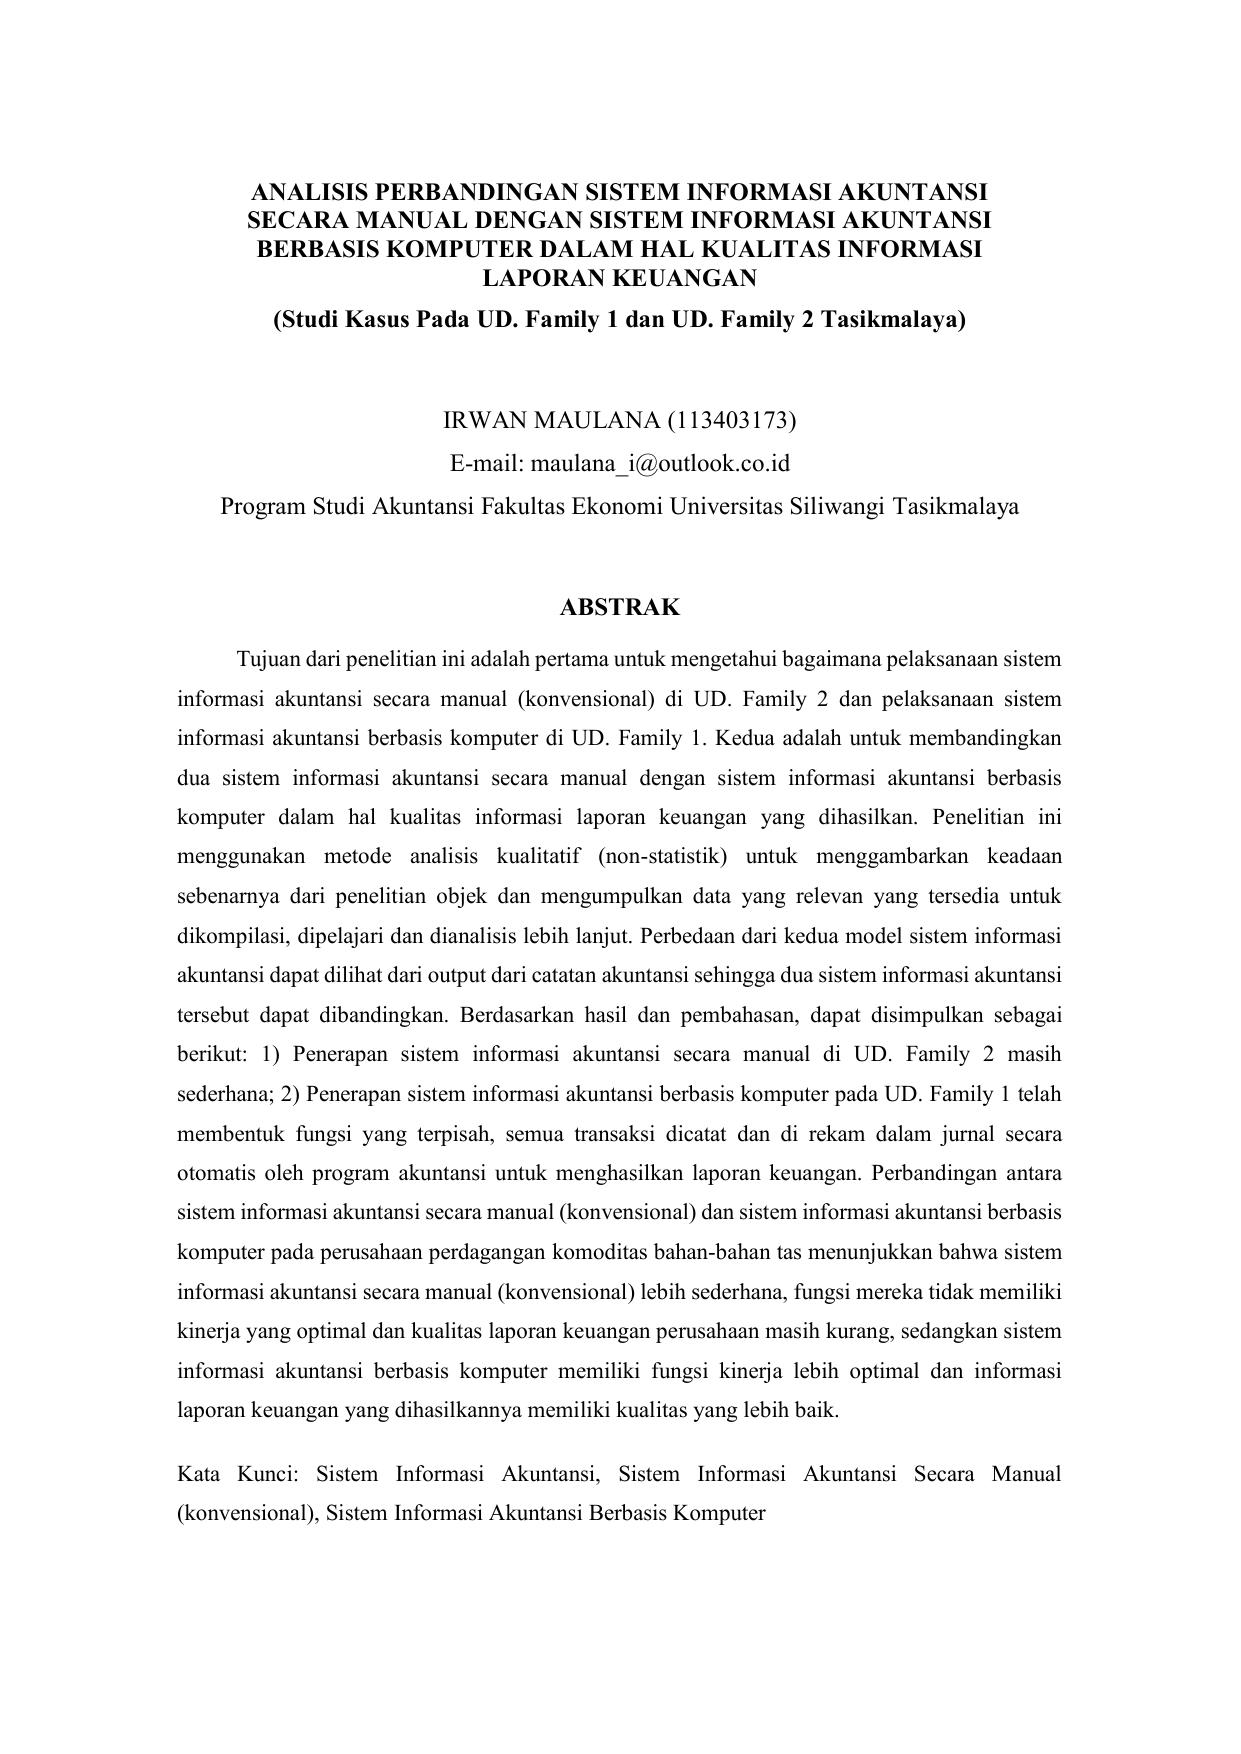 Analisis Perbandingan Sistem Informasi Akuntansi